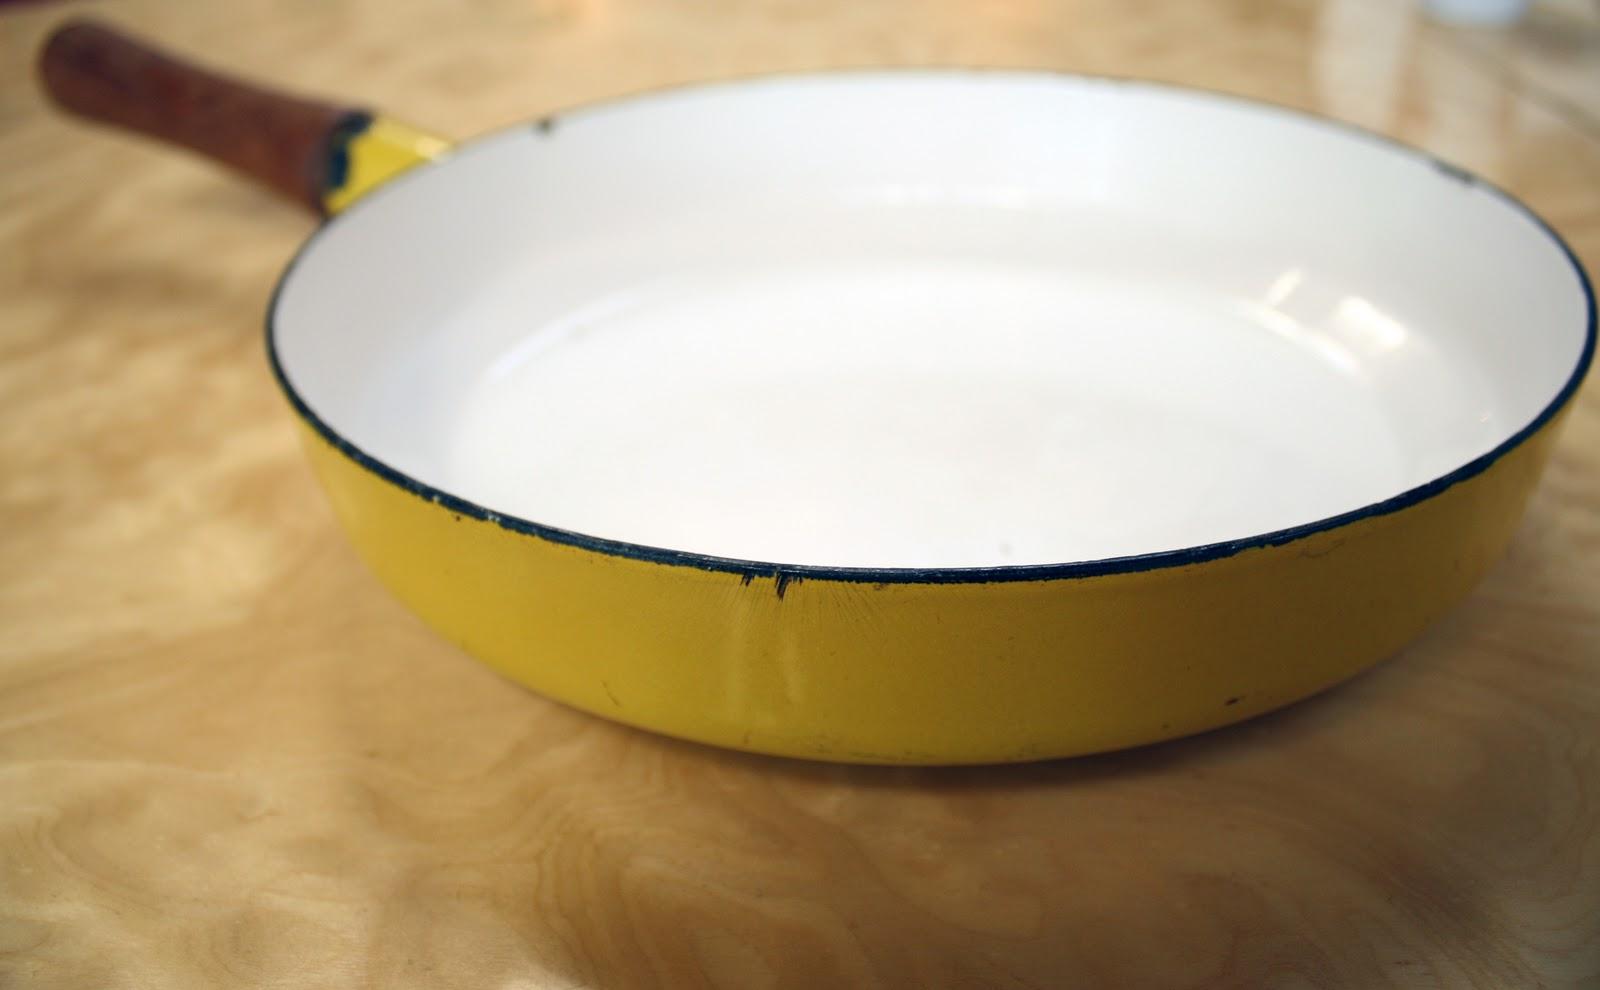 Douglascain Vintage Dansk Kobenstyle Enamel Cookware